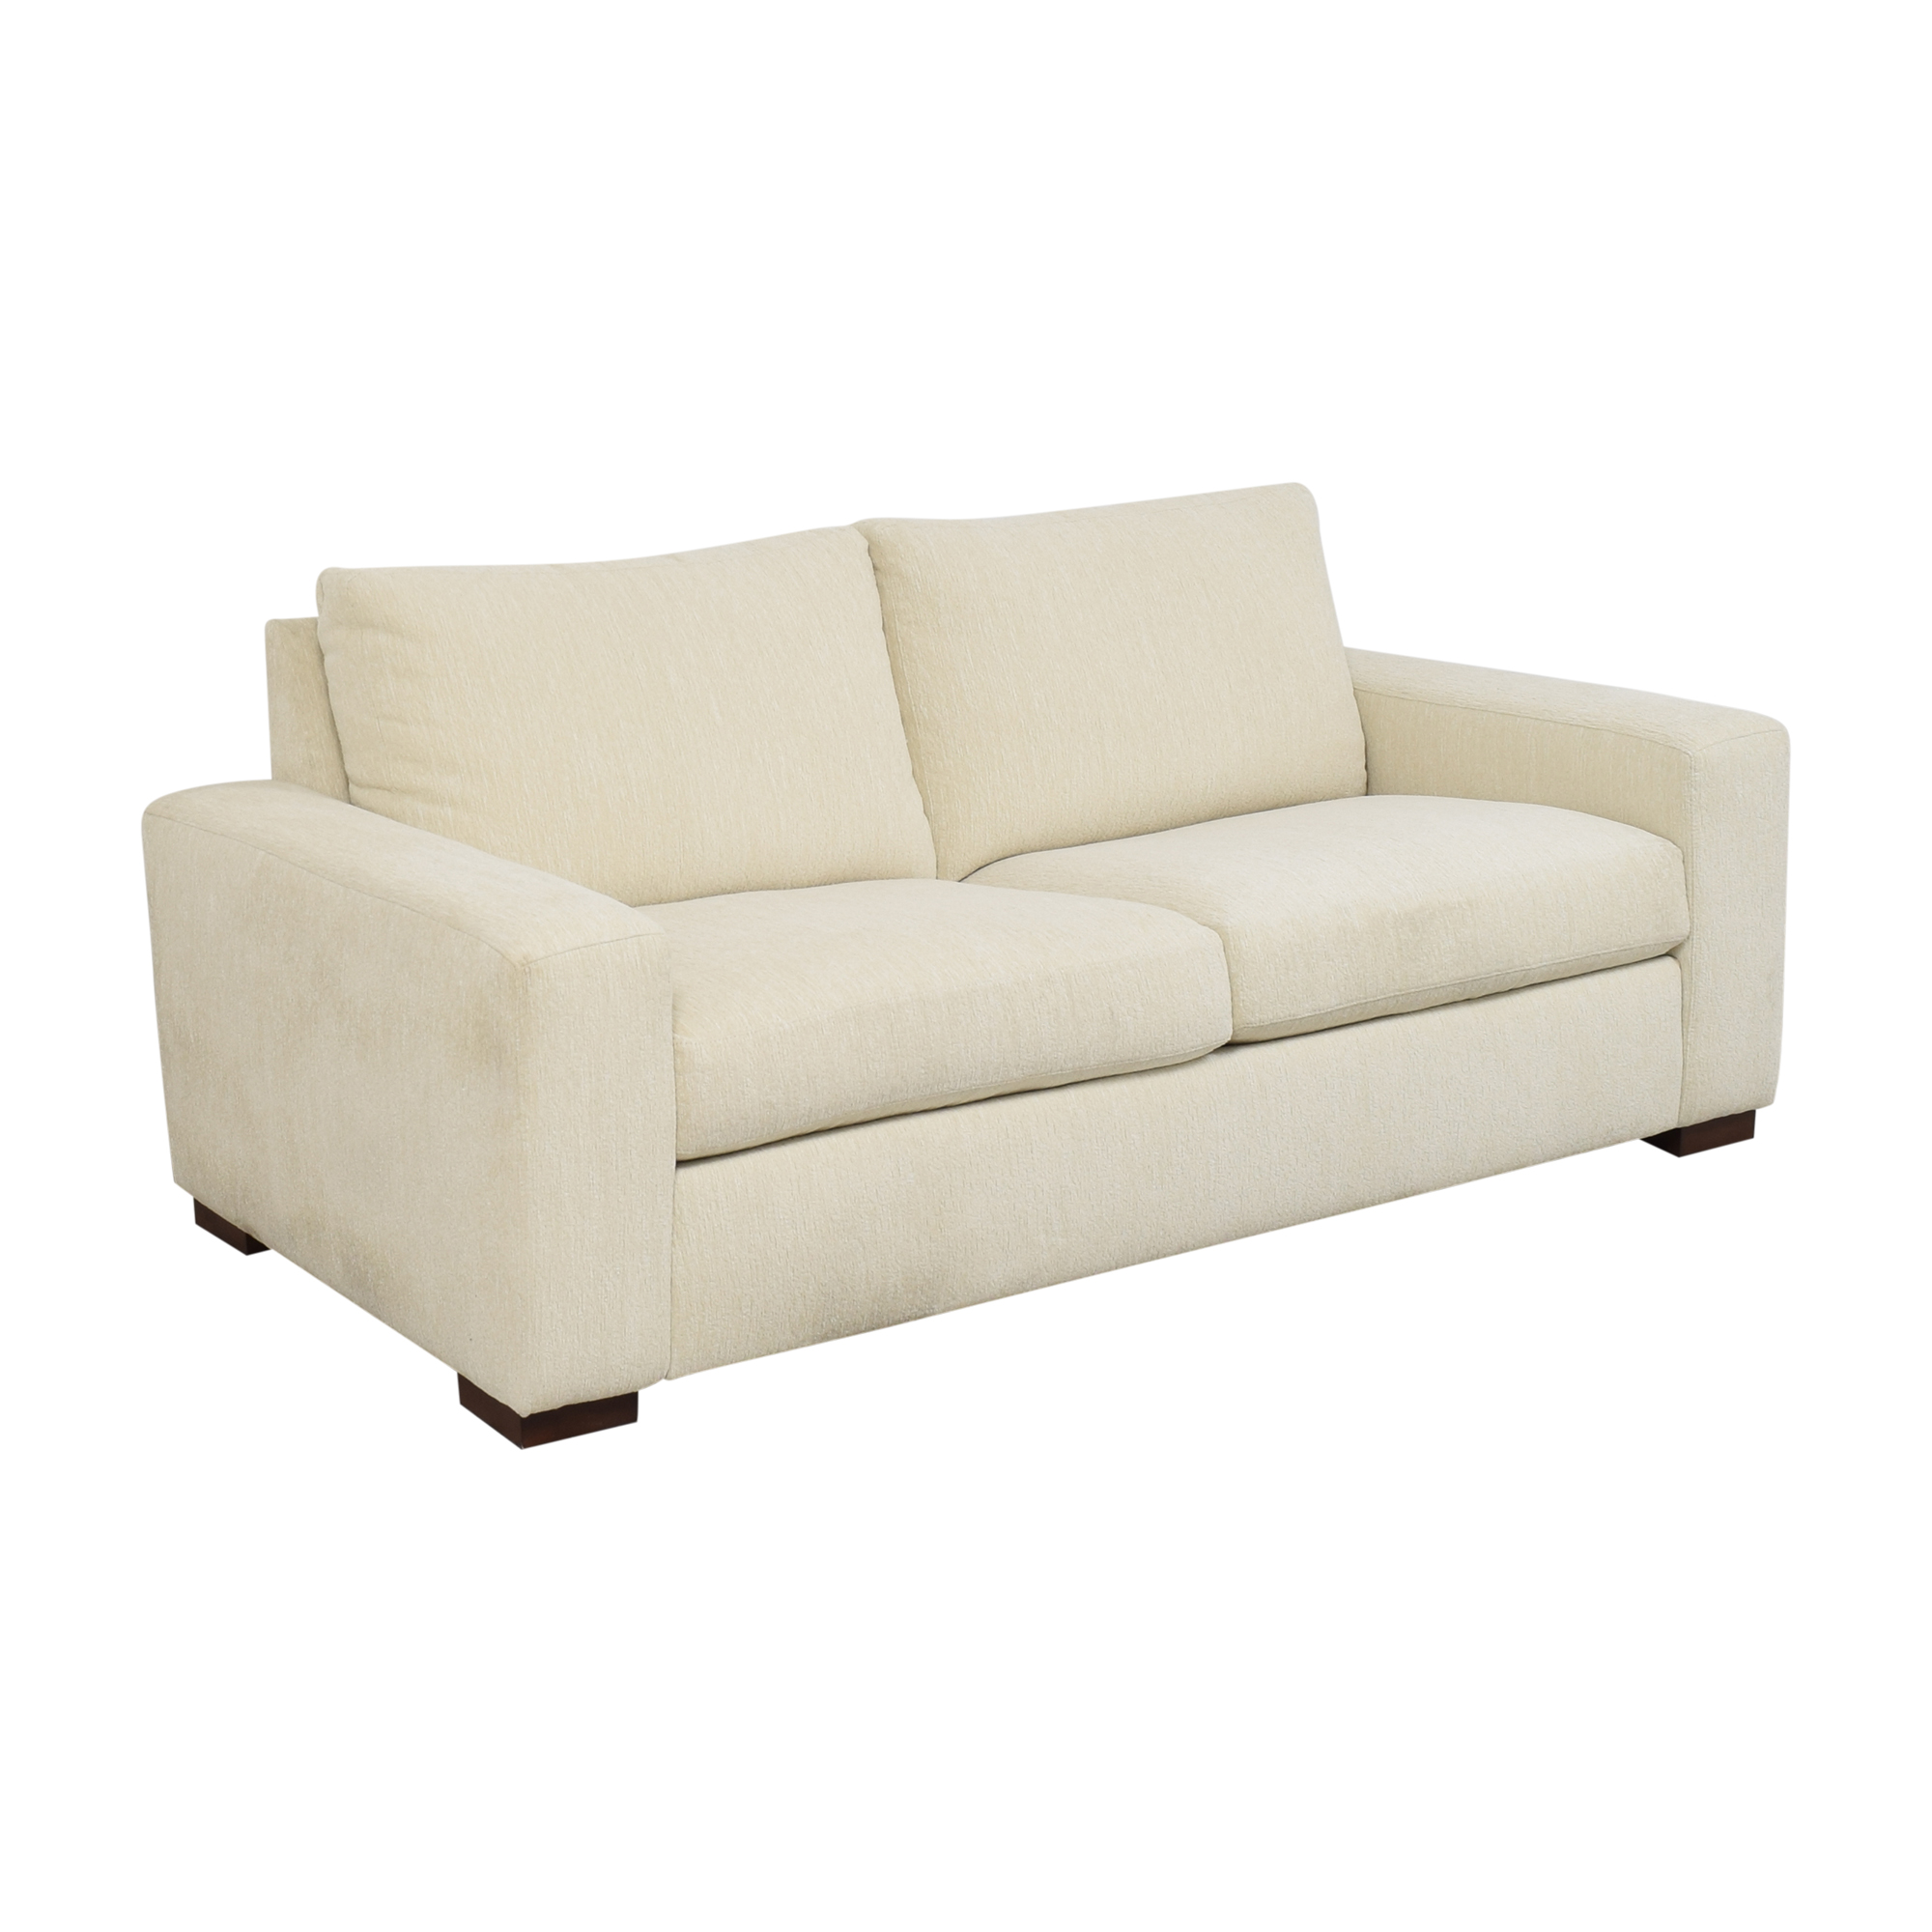 BenchMade Modern BenchMade Modern Couch Potato Sofa second hand